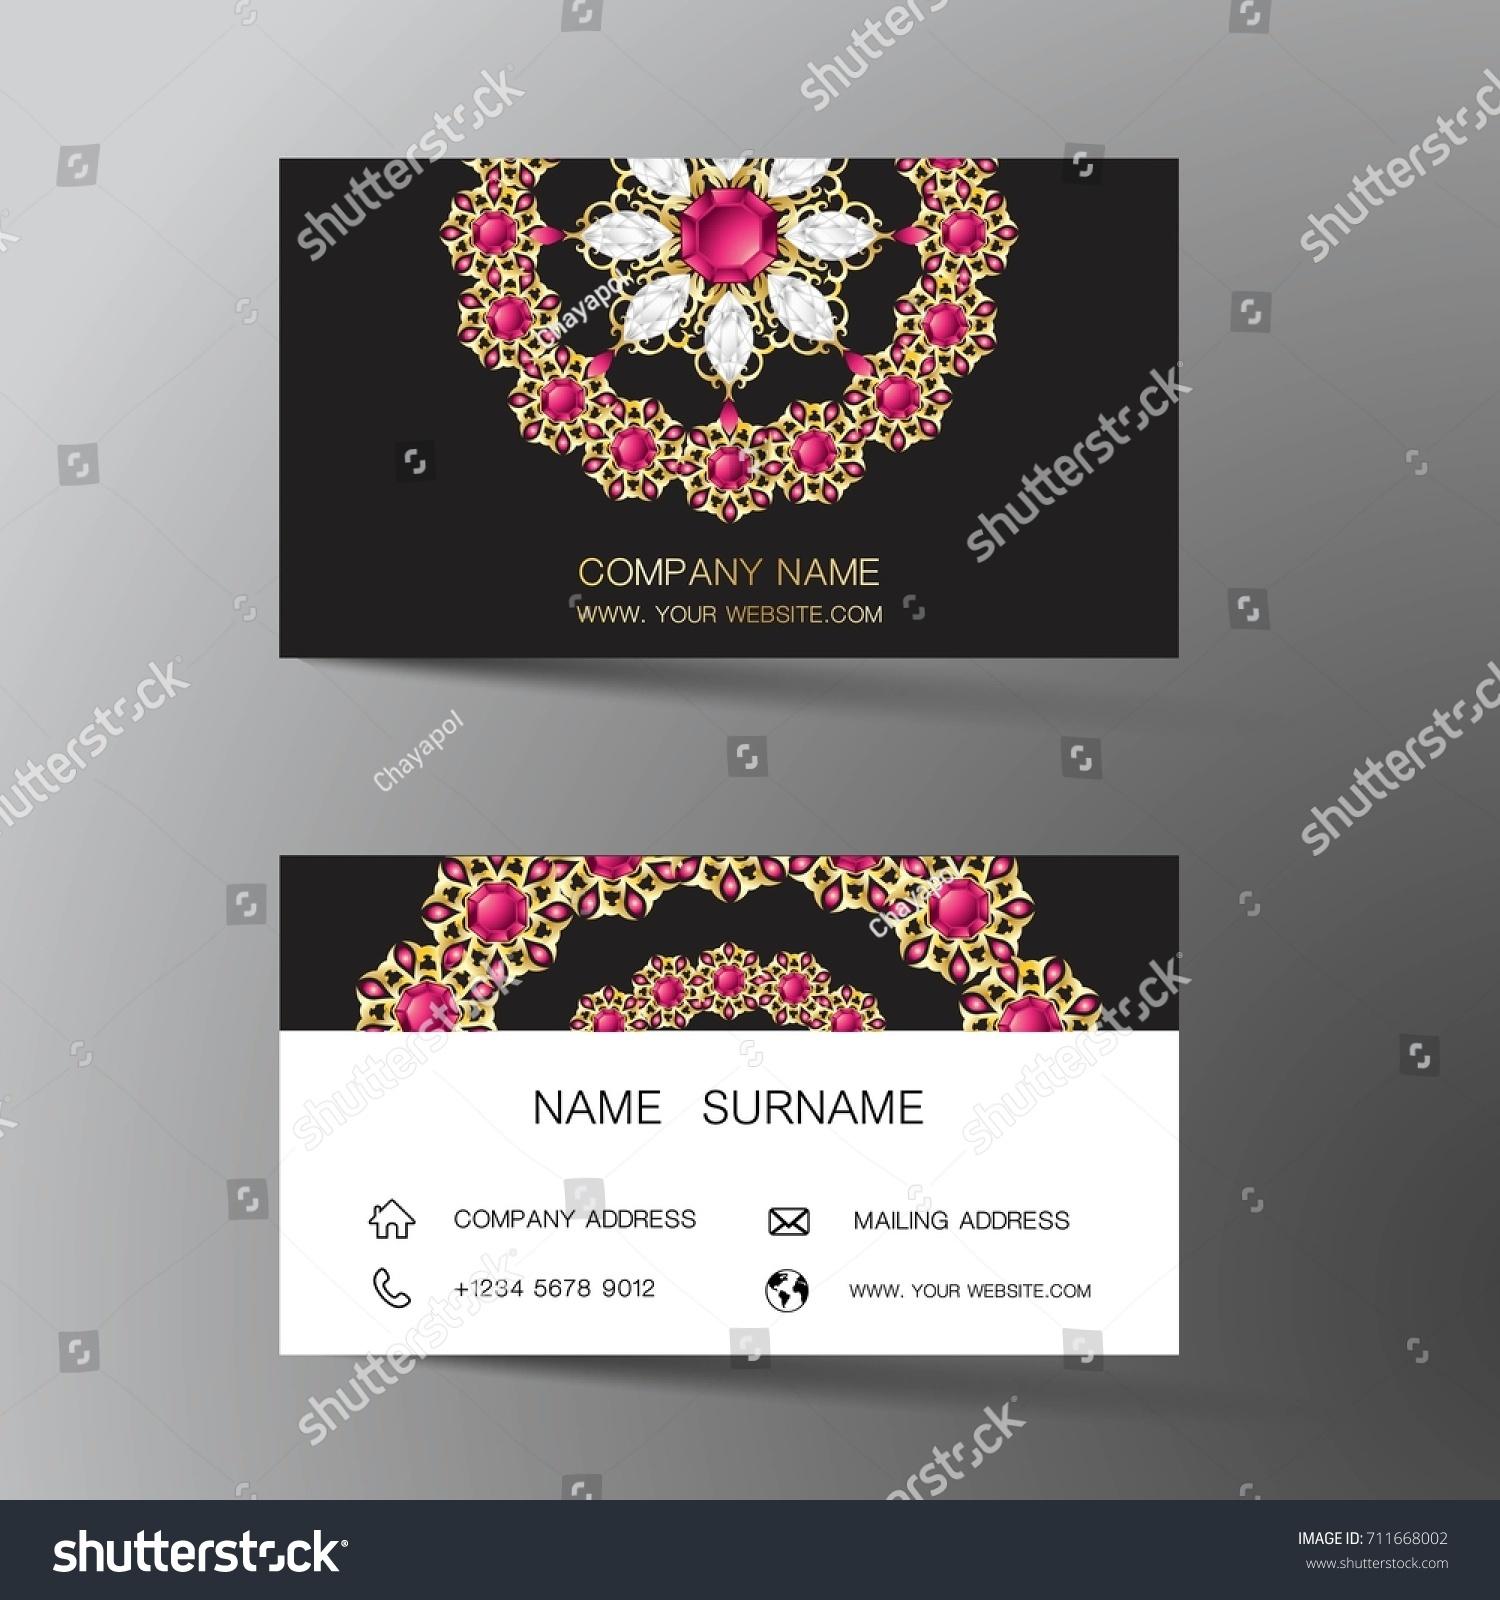 Luxurious indian business card design diamond stock vector luxurious indian business card design diamond gem jewelry colorntact card for company magicingreecefo Choice Image